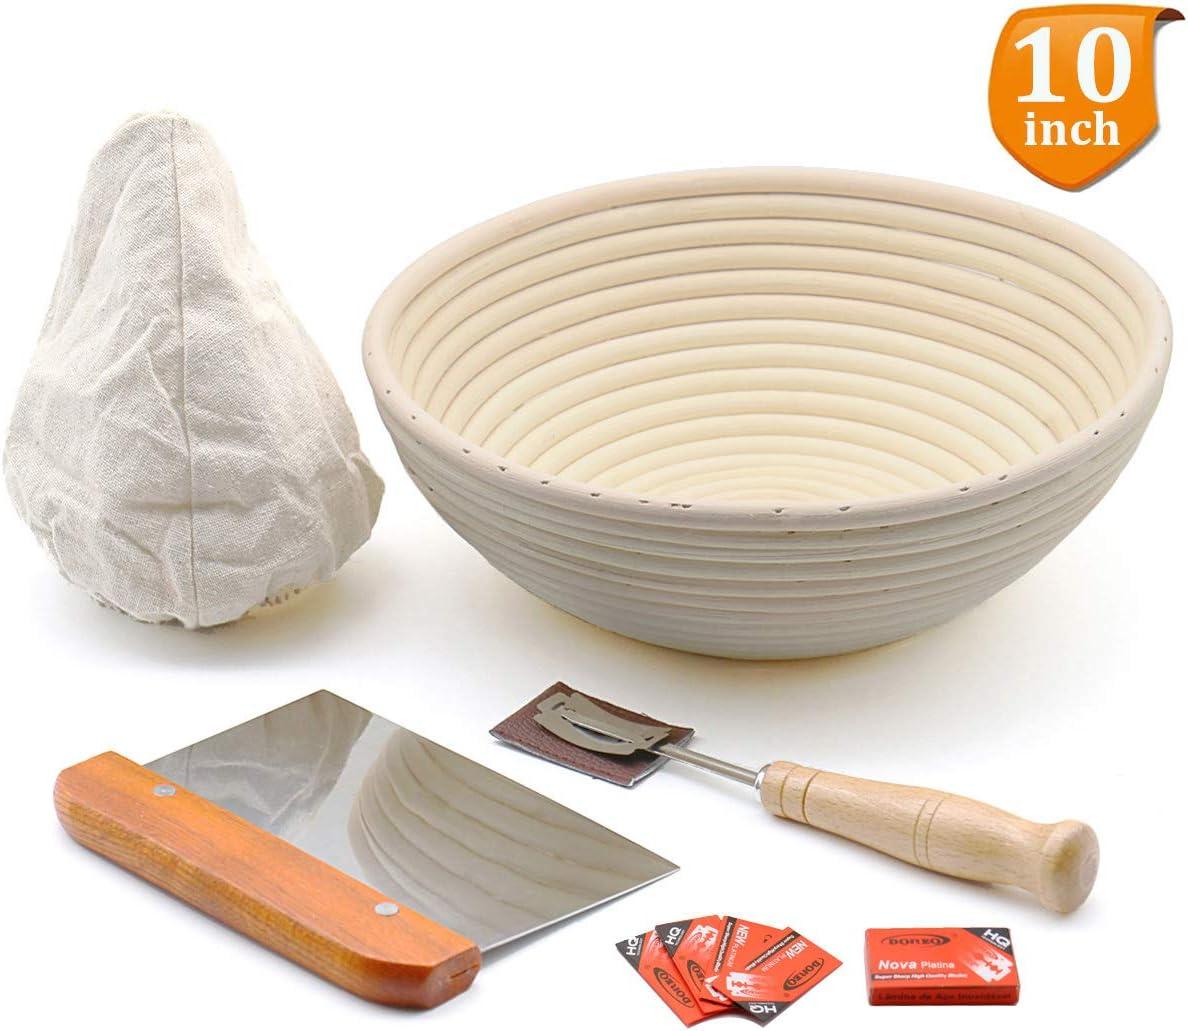 "10"" Round Bread Banneton Proofing Basket for Sourdough, Includes Linen Liner, Metal Dough Scraper, Scoring Lame & Case, Extra Blades, Rising Dough Baking Bowl Gifts for Artisan Bread Making Starter"